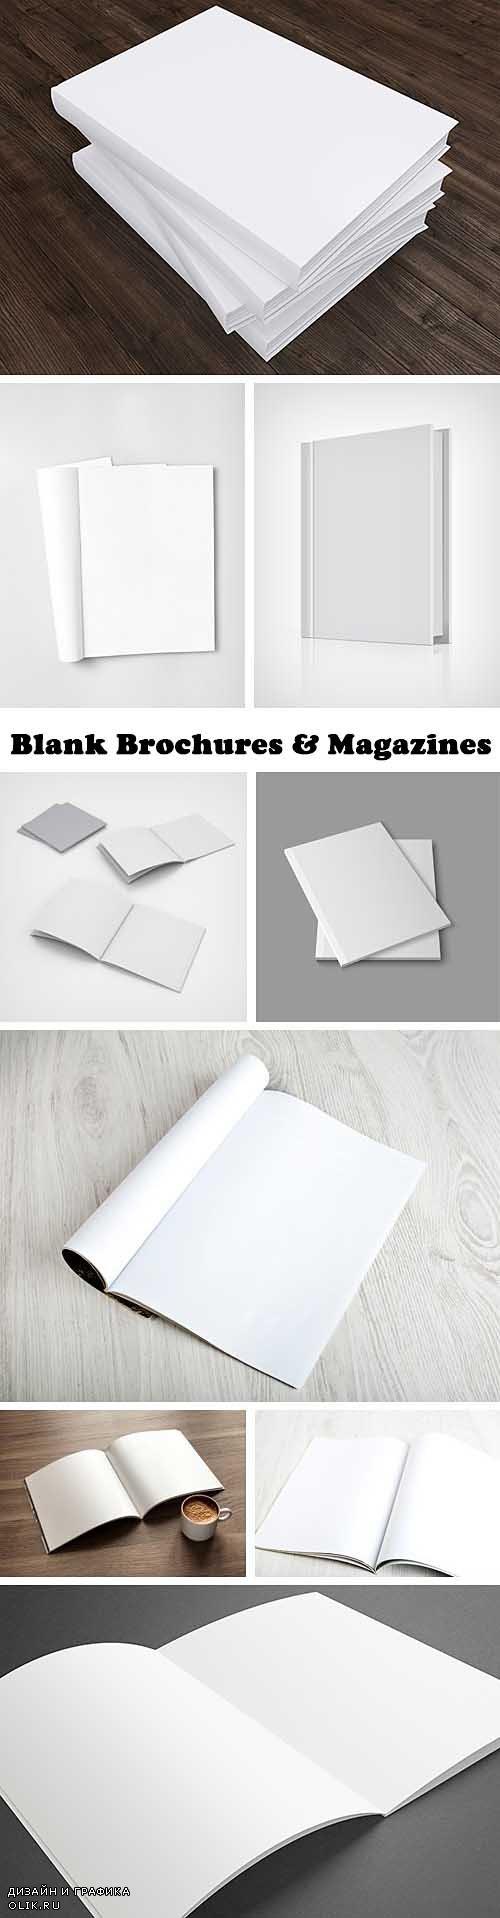 Blank Brochures & Magazines